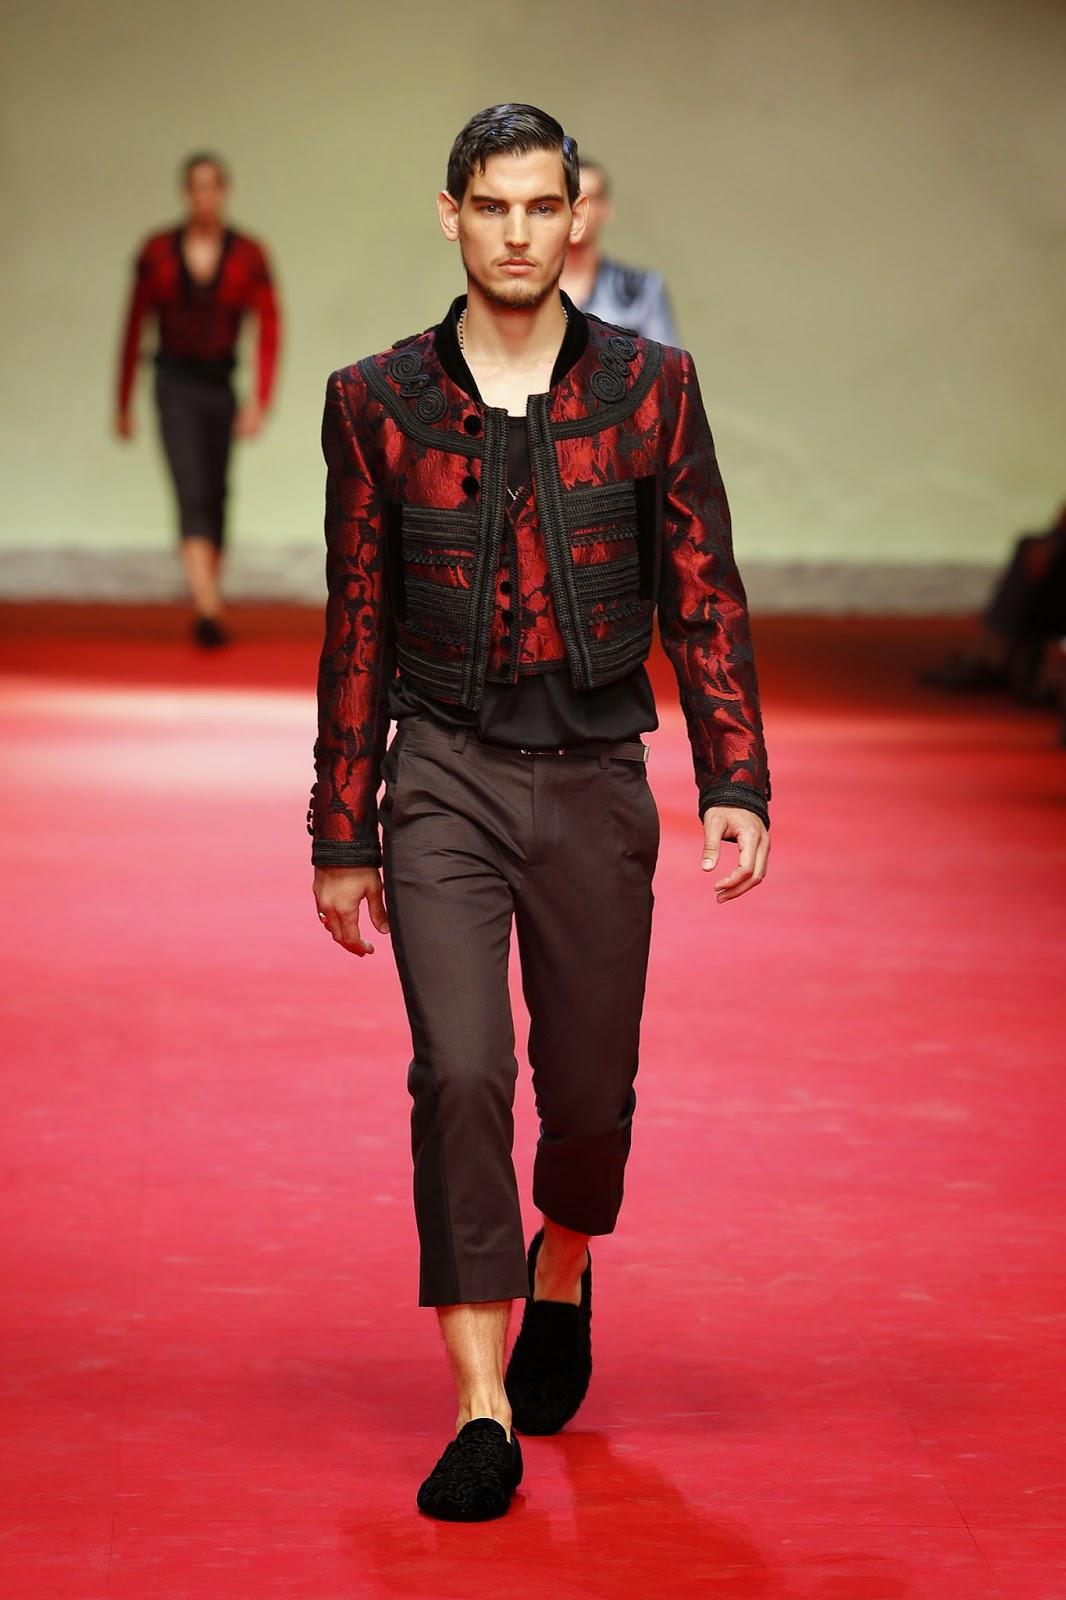 506a423f425 Nelson Argumedo  Milan Fashion Week SS 2015  Dolce   Gabbana